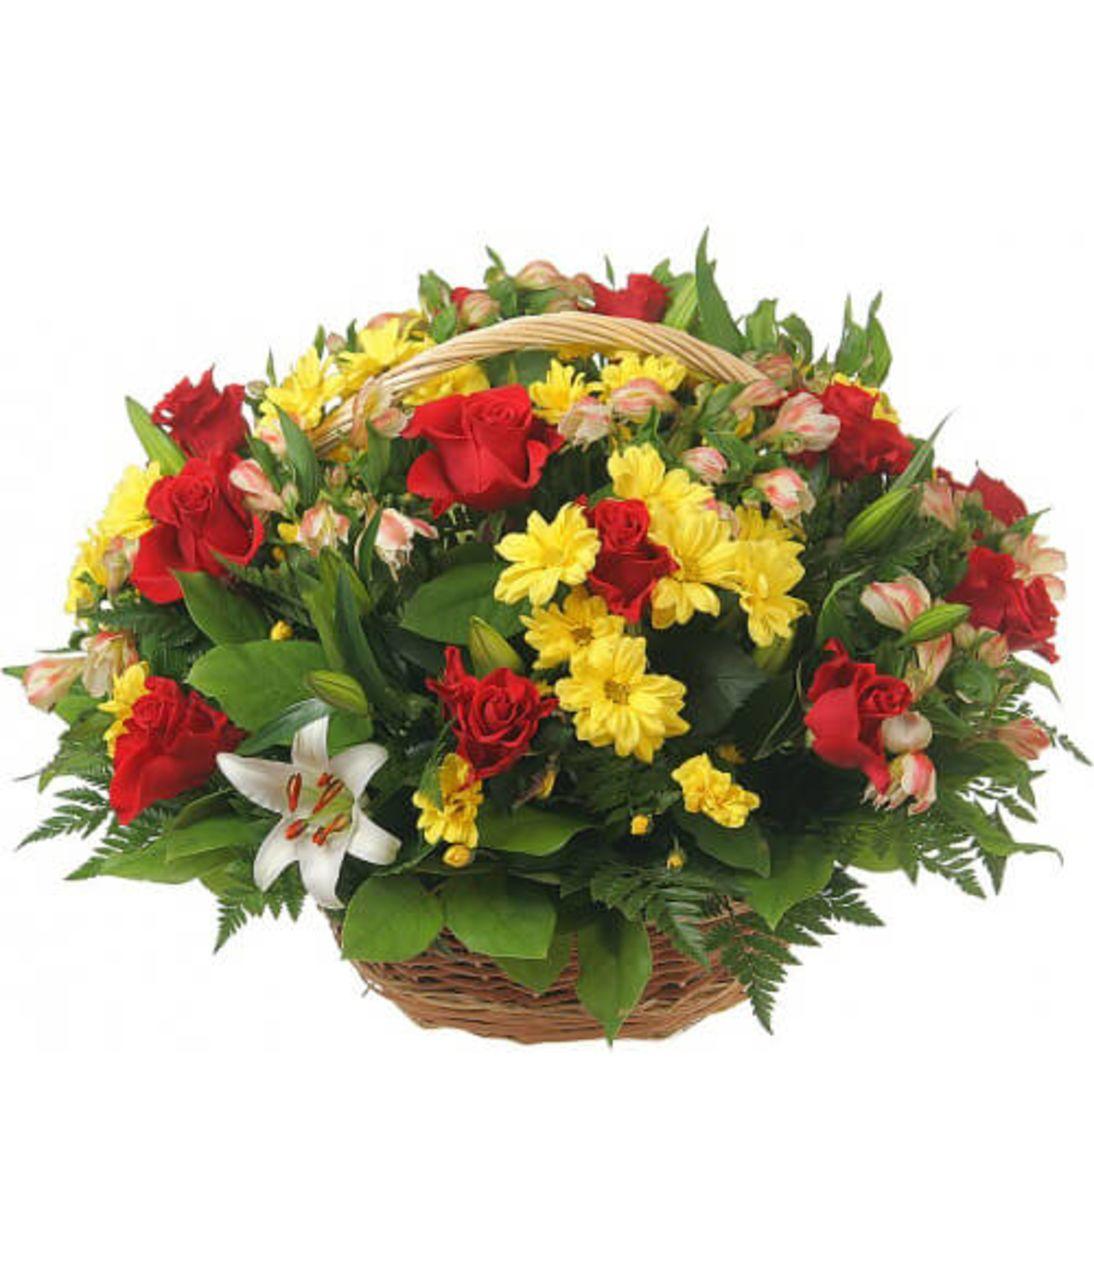 купити ЗахопЗахоплення. Superflowers.com.ua